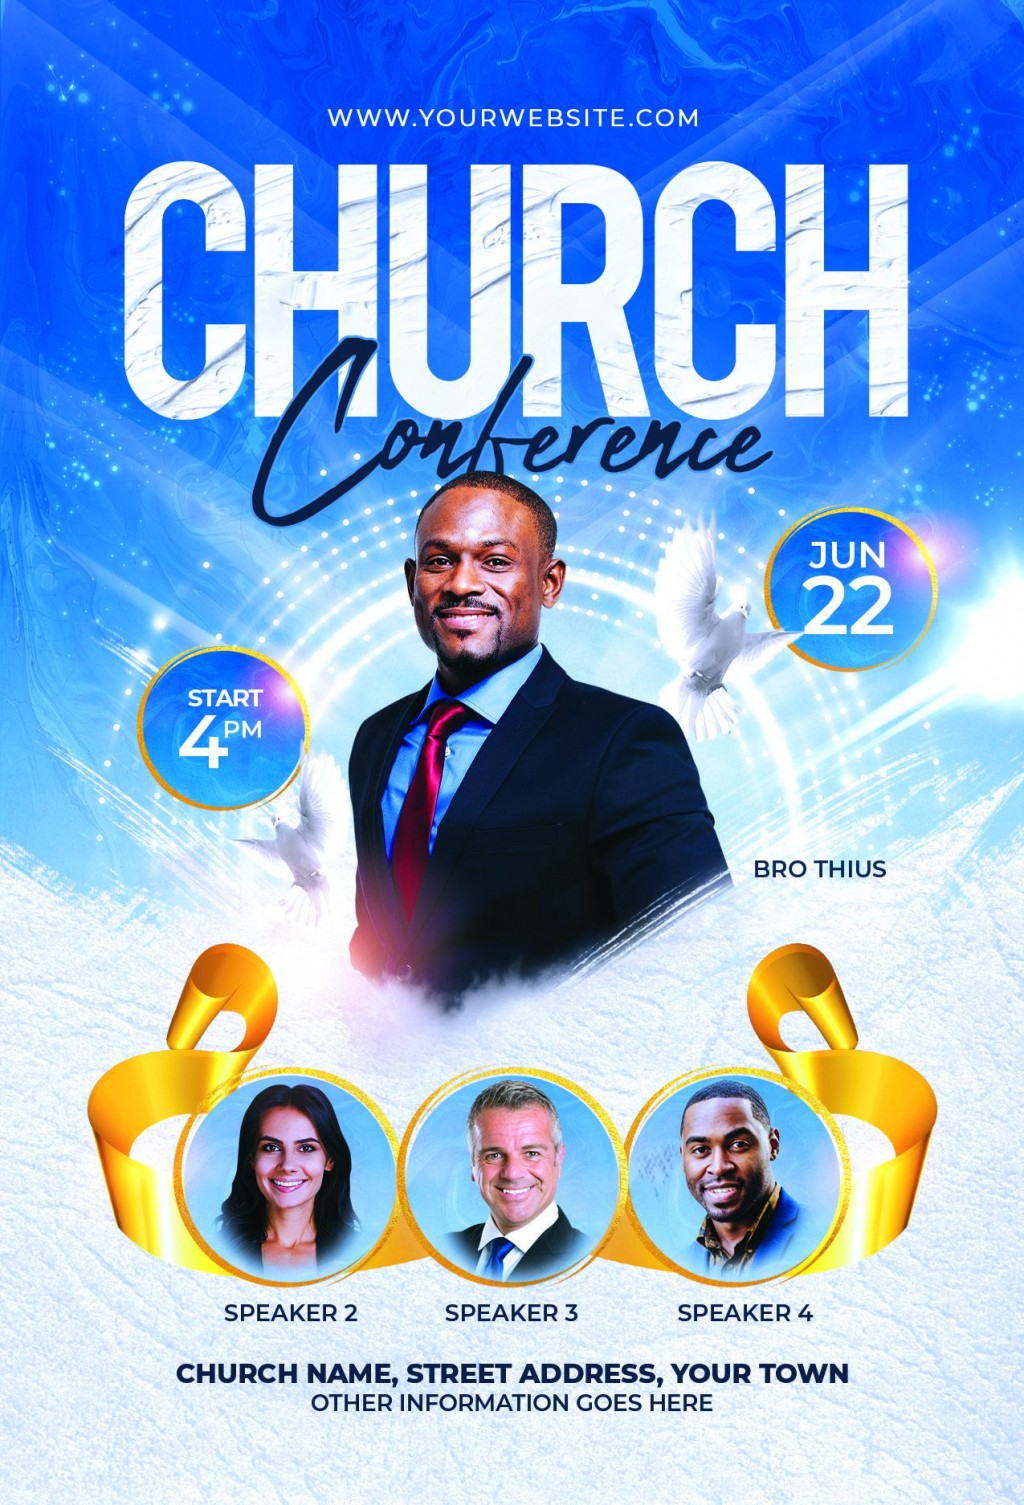 003 Impressive Church Flyer Template Photoshop Free High Resolution  PsdLarge